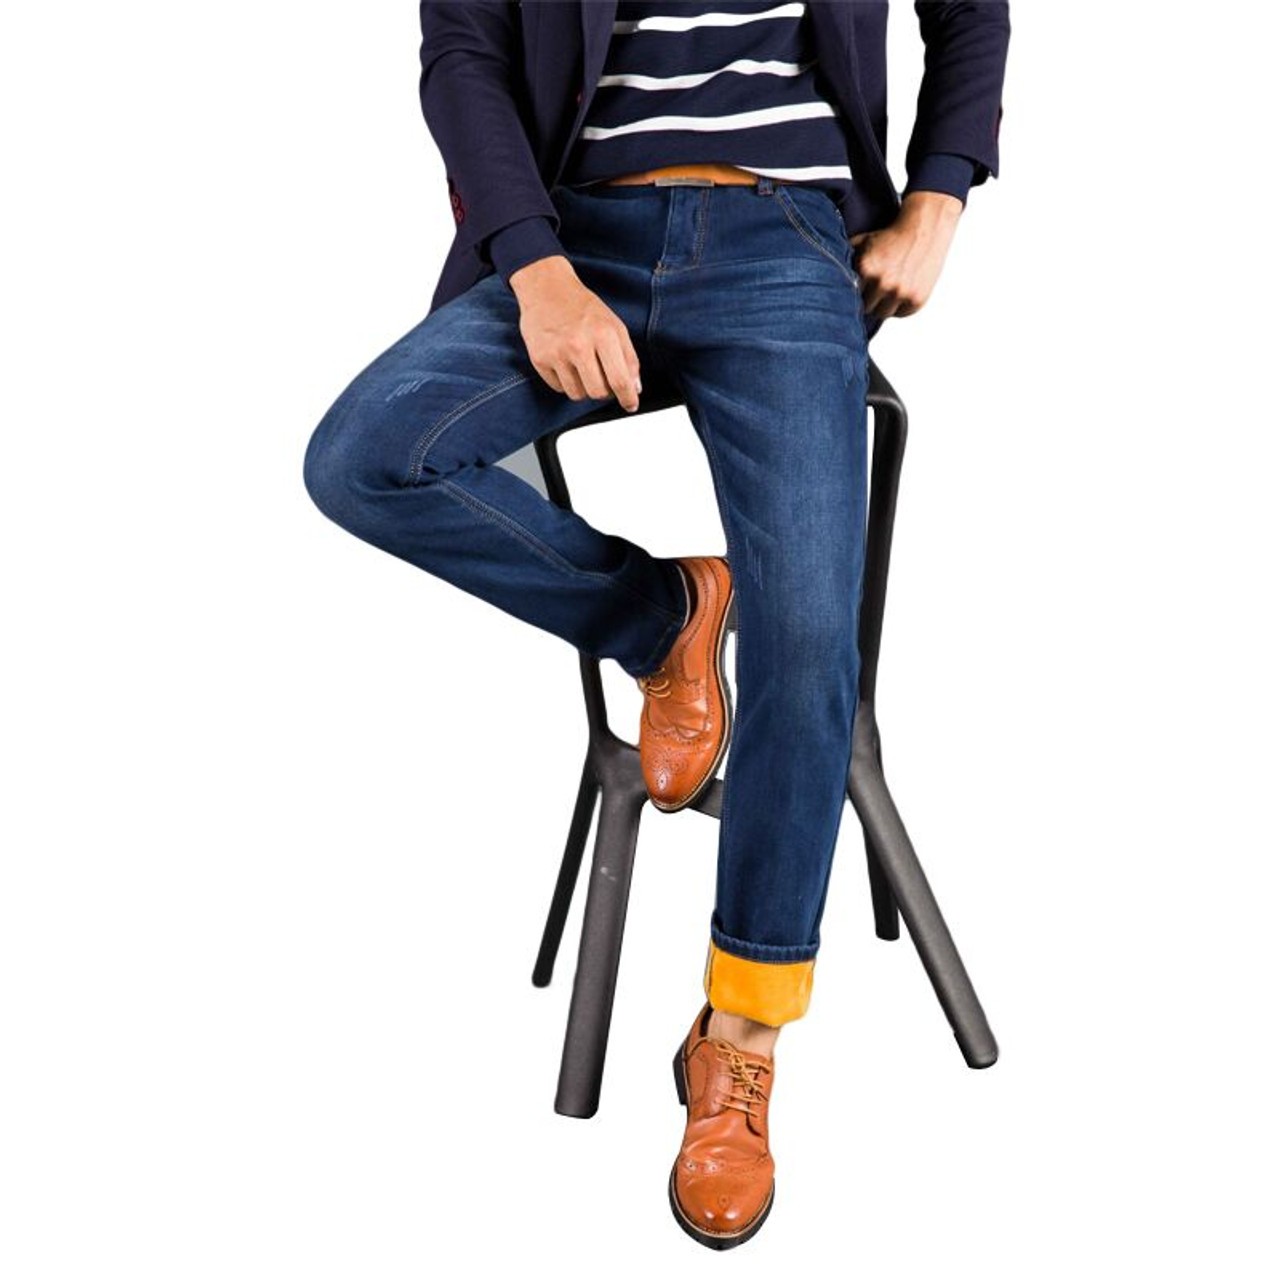 938e10c7d5 ... 2018 Winter New Men s Warm Jeans Business Casual Elasticity Thick Slim Denim  Pants Brand Trousers Black ...